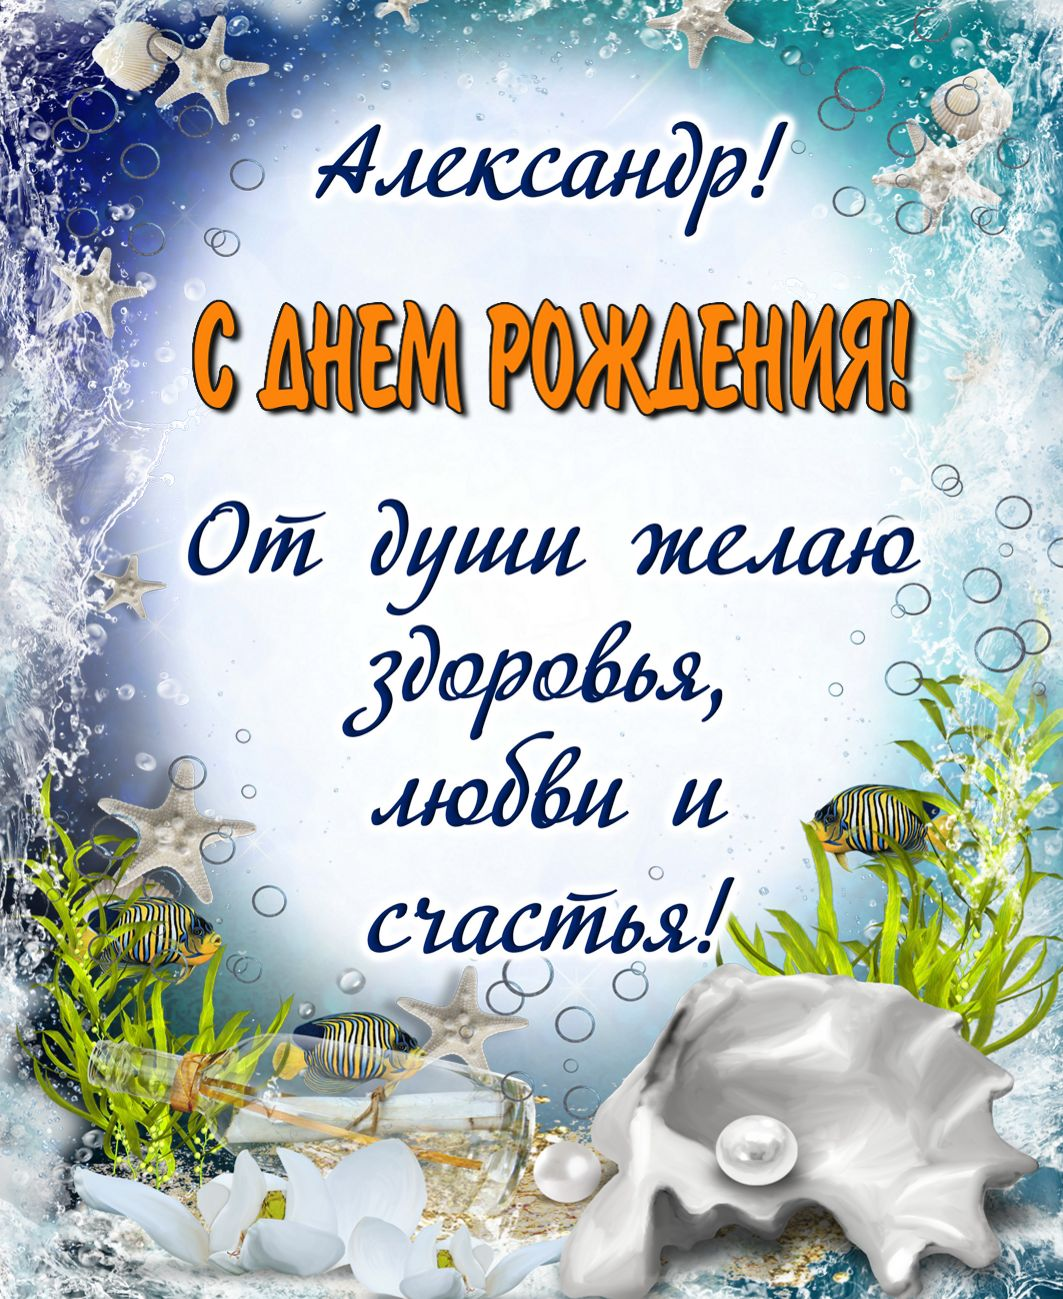 Поздравления с днем рождения от александра рыбака